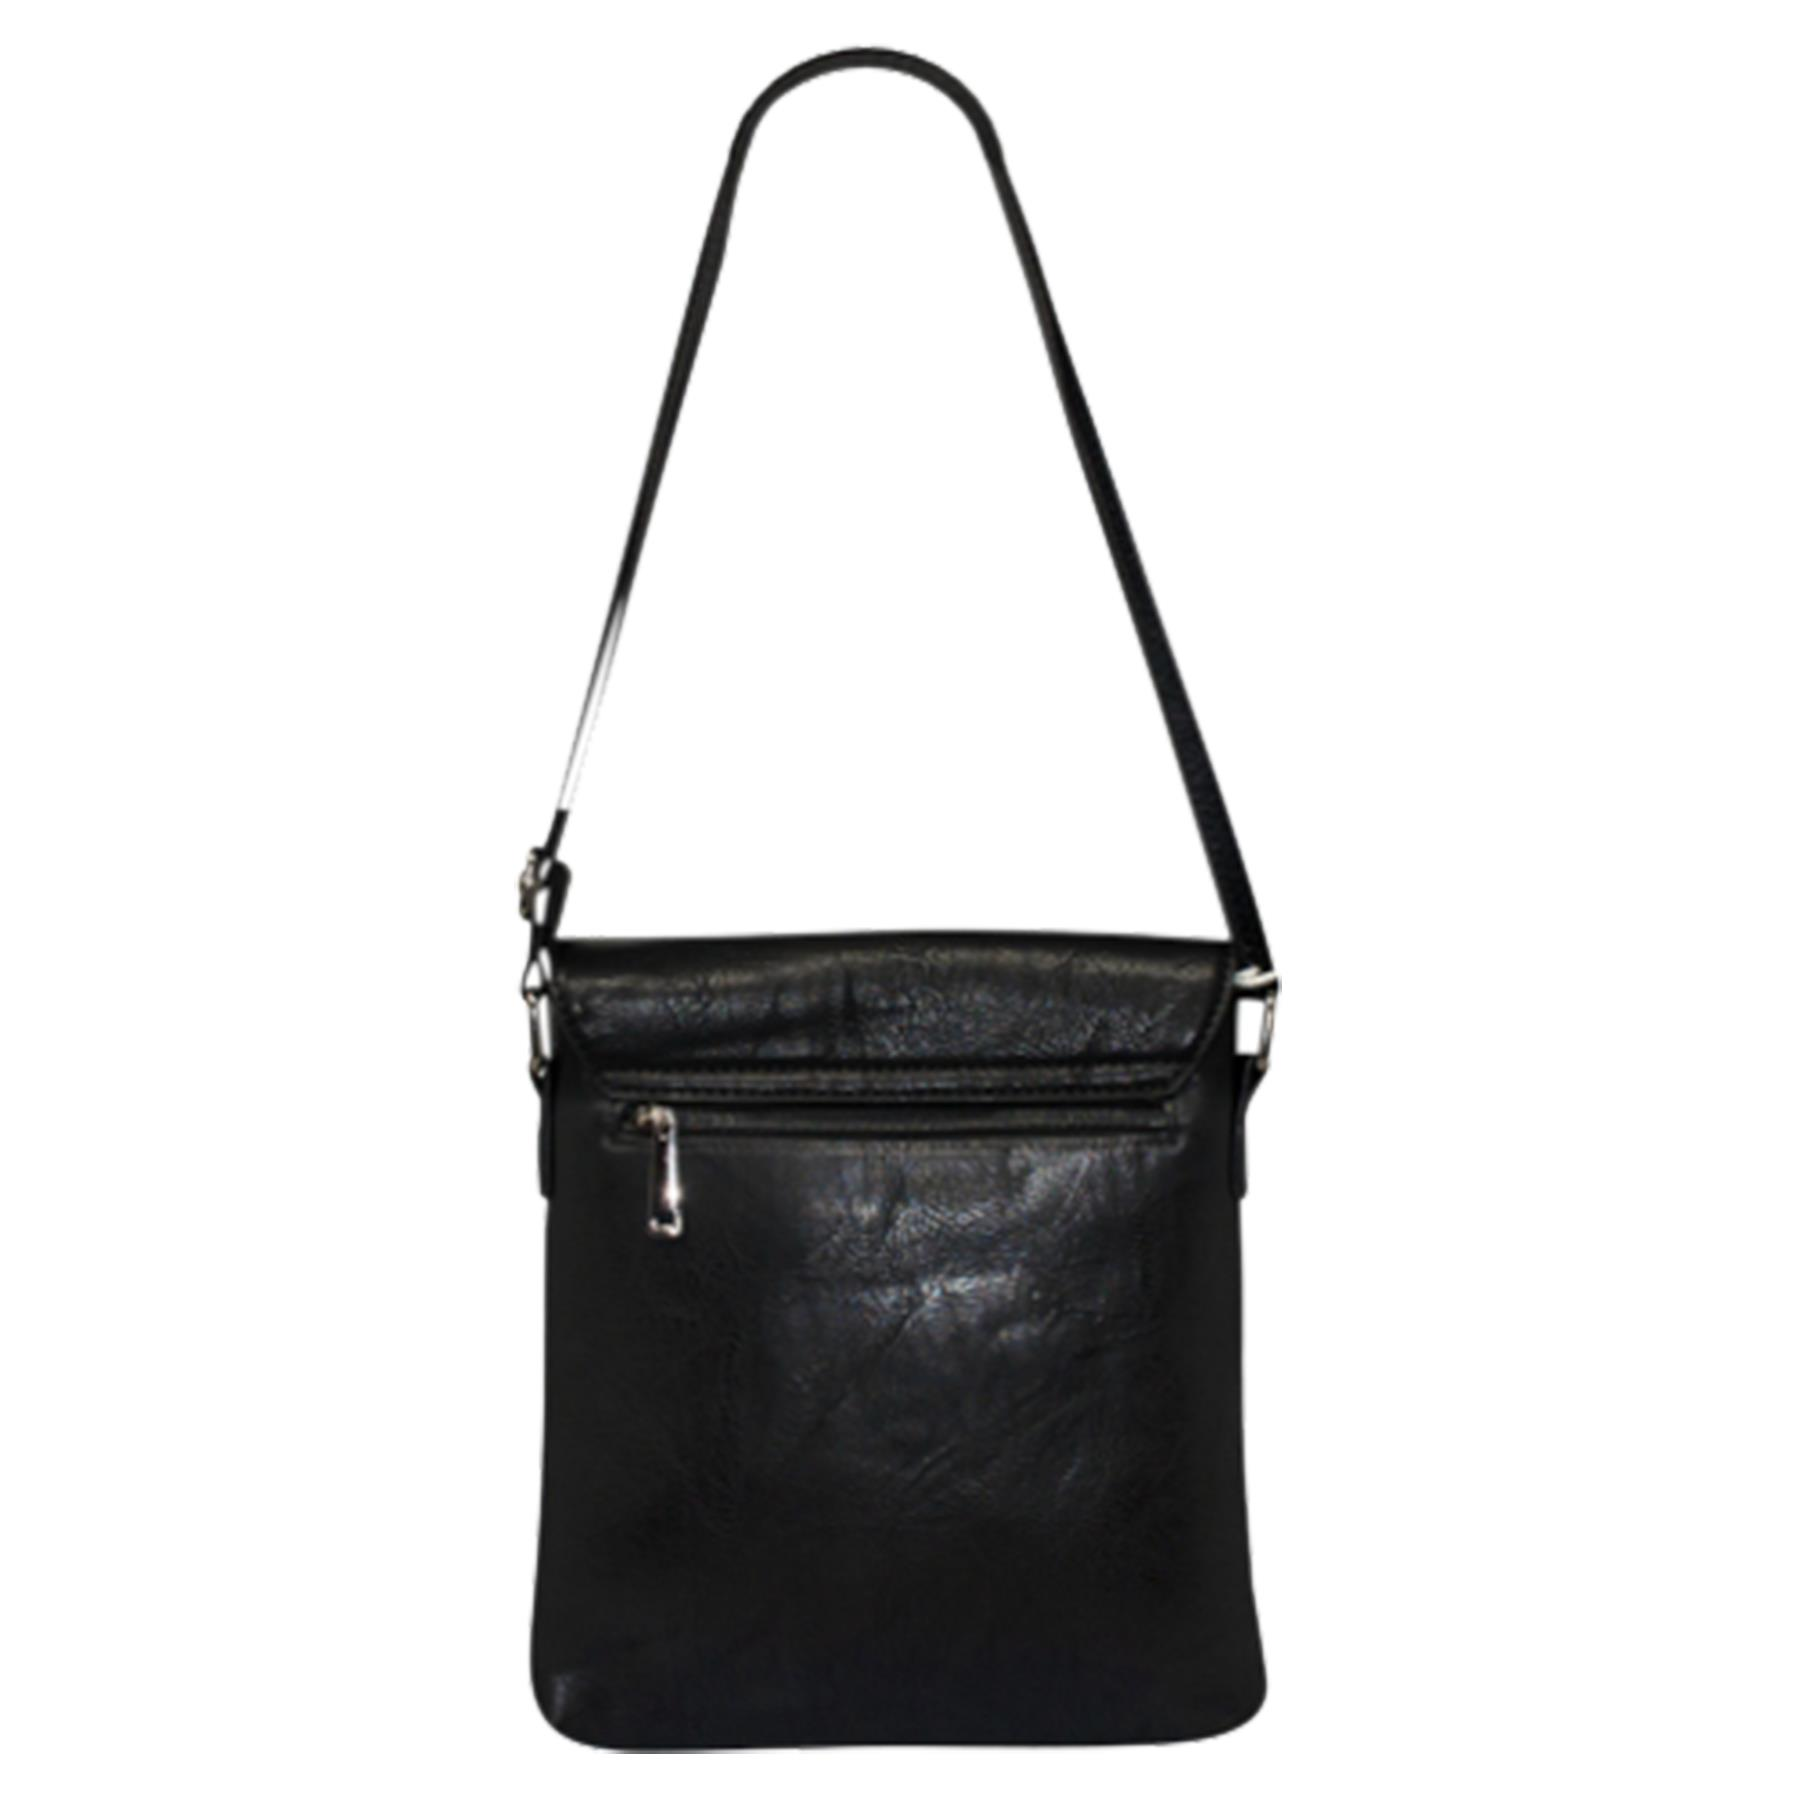 New-Plain-Faux-Leather-Men-s-Travel-Casual-Flap-Over-Messenger-Bag thumbnail 4